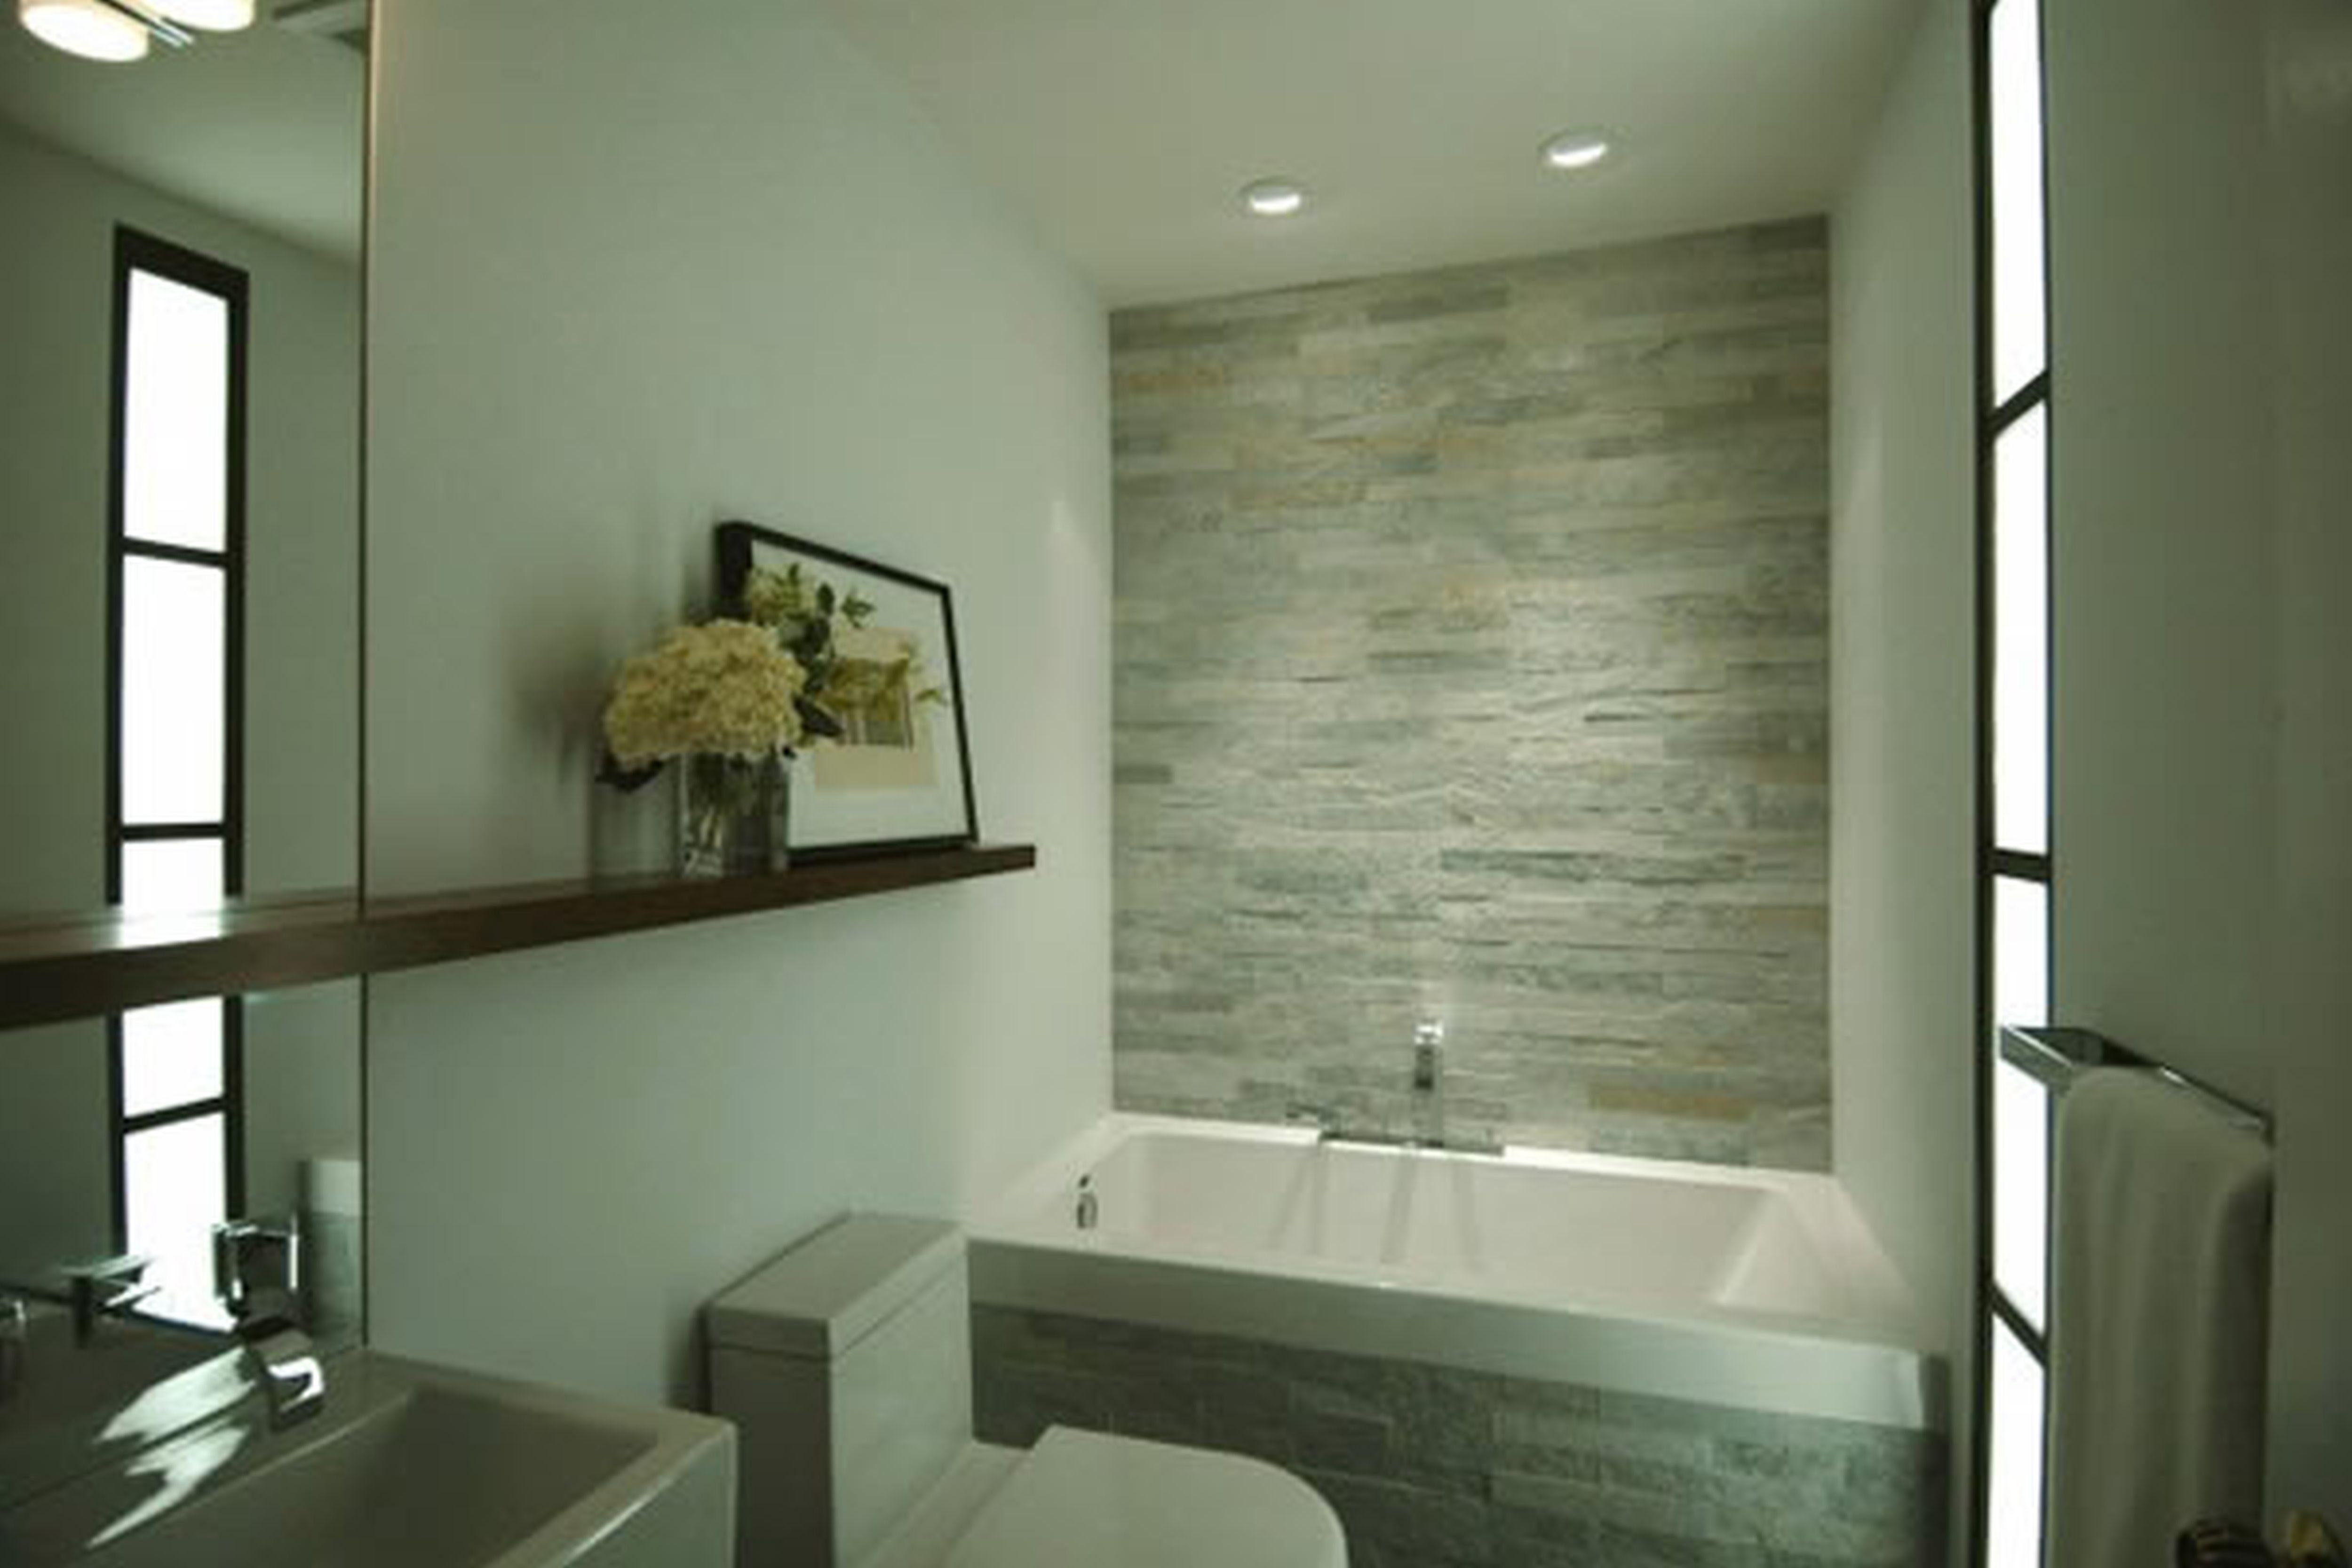 Awe Inspiring Modern Small Bathroom Ideas Master Bathrooms ... on hgtv remodeled bathrooms, hgtv pool designs, hgtv home bathrooms, hgtv property brothers bathrooms, hgtv bar designs, hgtv master bathrooms gallery, hgtv kitchen, guest suite design, hgtv walk in closet designs, hgtv deck designs, hgtv luxury bathrooms, hgtv elegant bathrooms, hgtv loft designs, hgtv bathrooms candice olson, hgtv best bathrooms, hgtv house designs, hgtv headboards designs, hgtv beautiful bathrooms, hgtv spa bathrooms, hgtv traditional bathrooms,